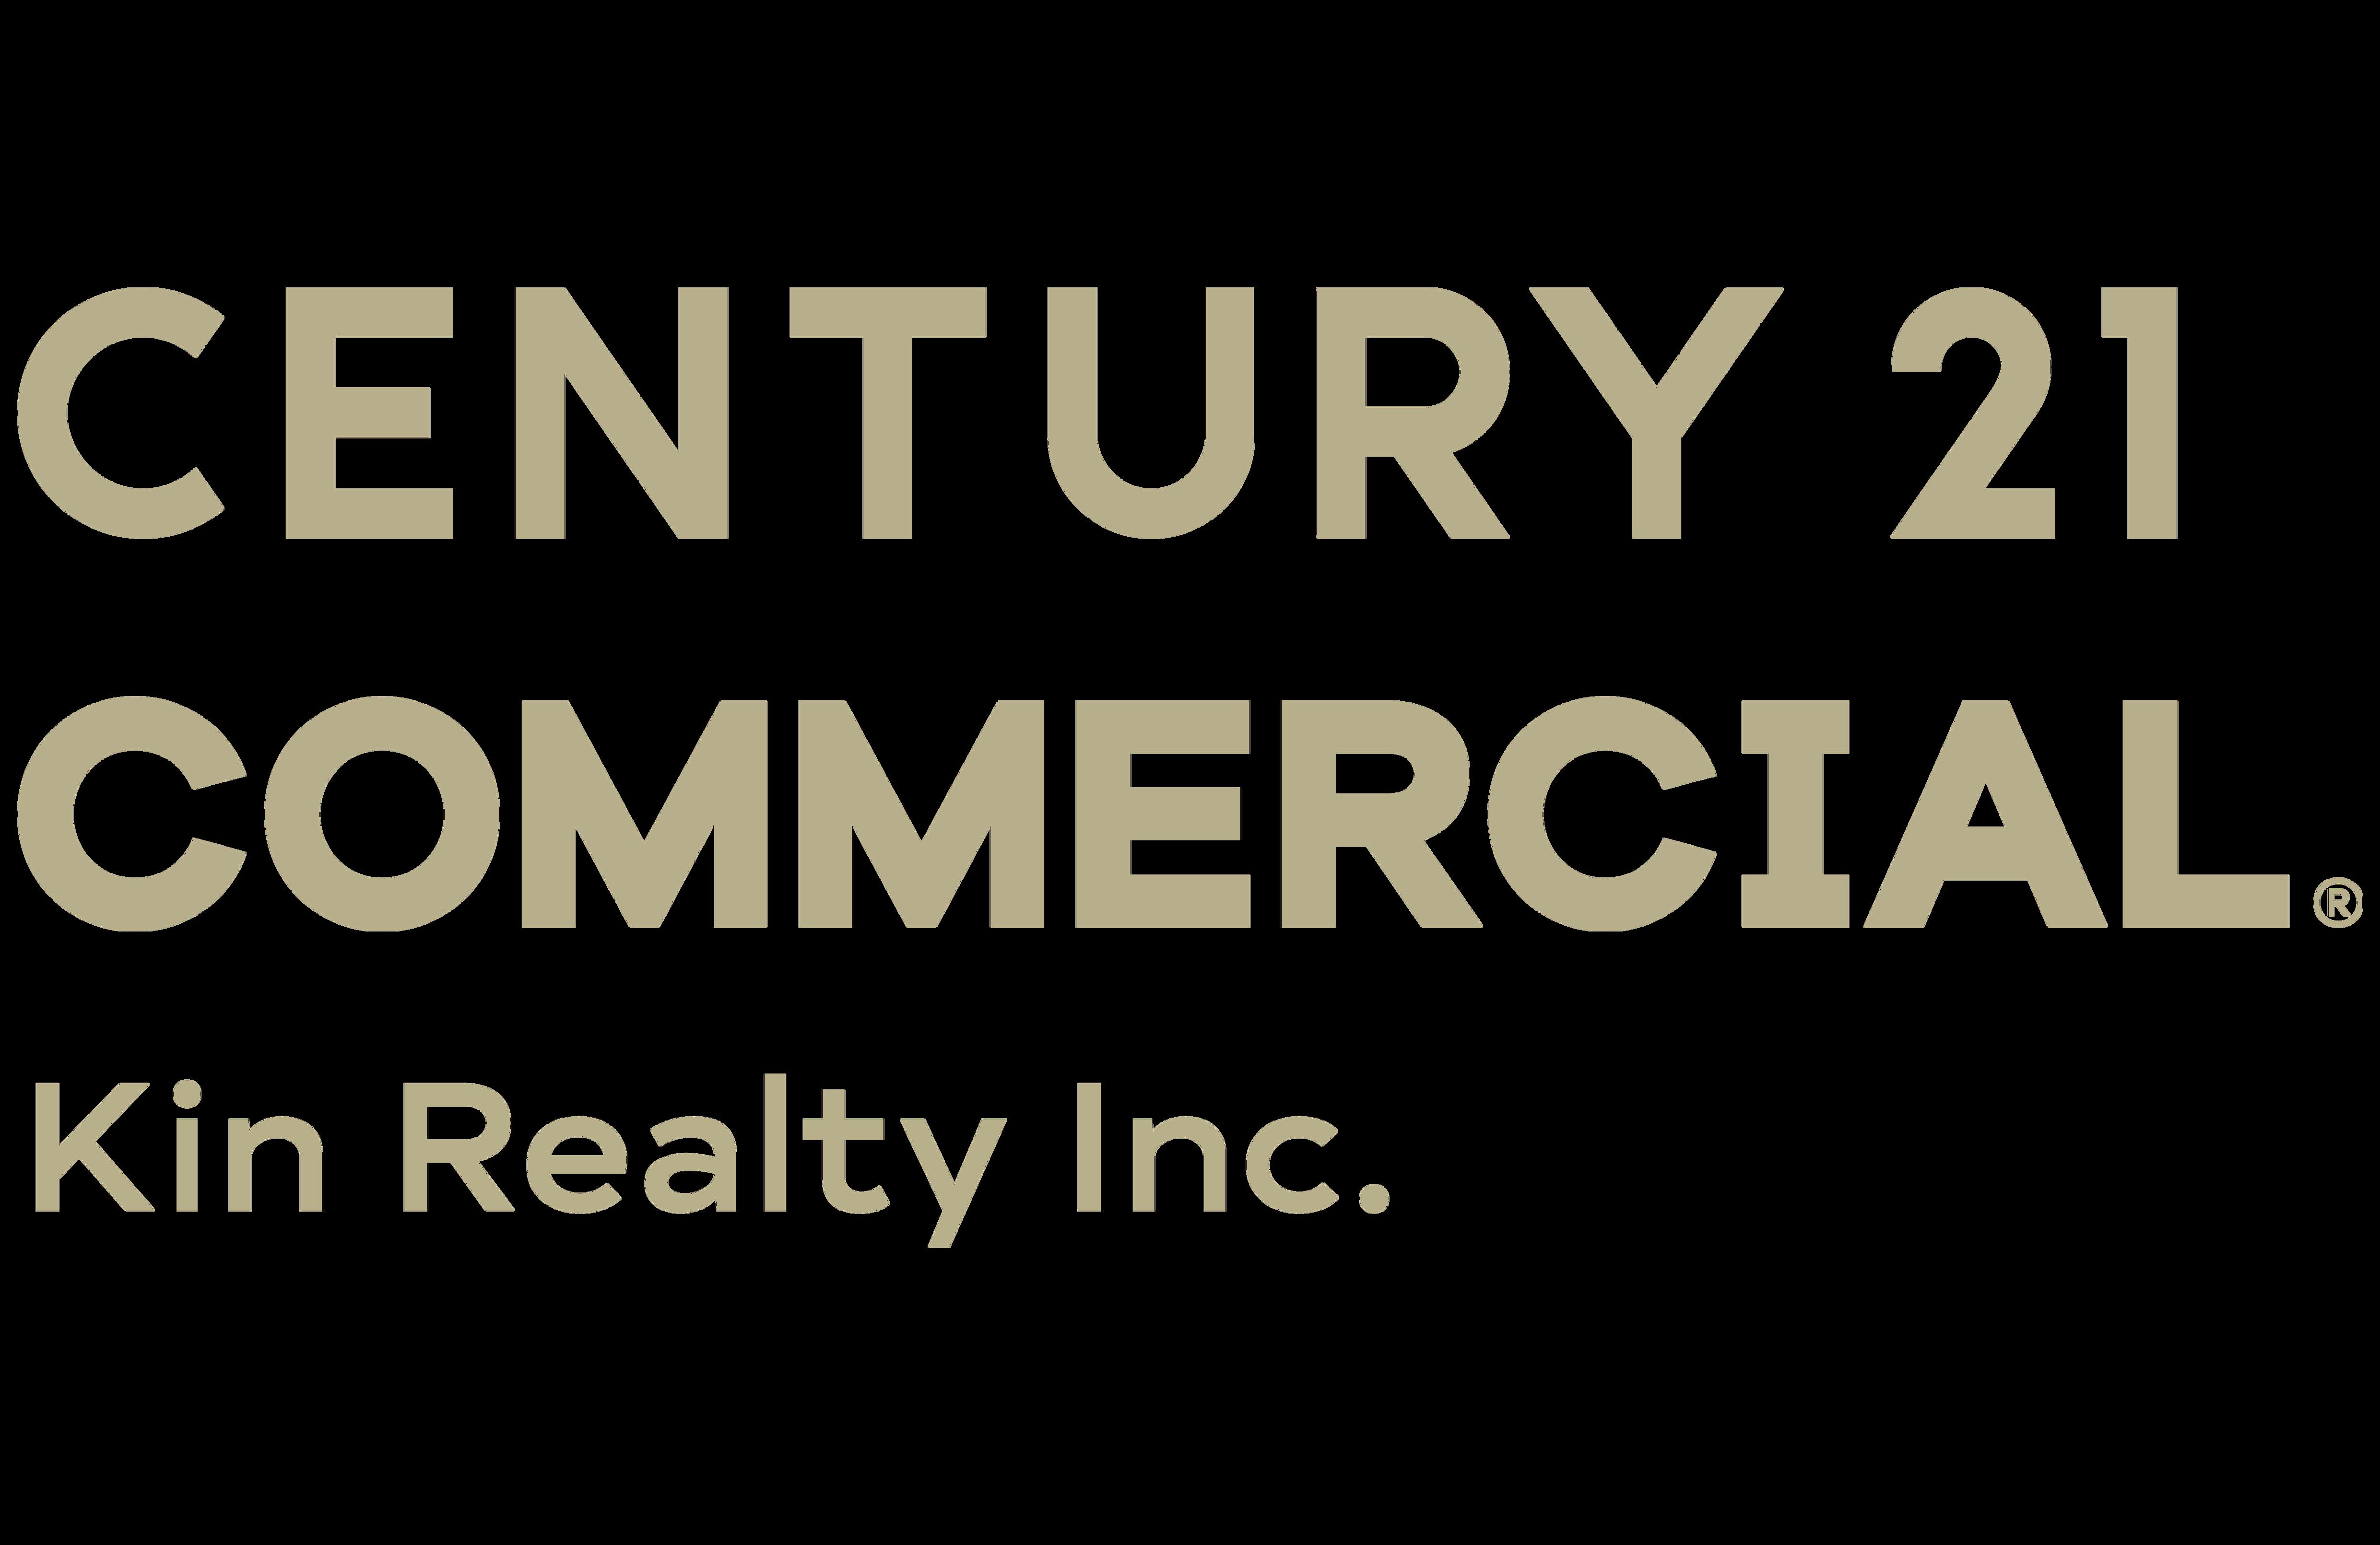 CENTURY 21 Kin Realty Inc.